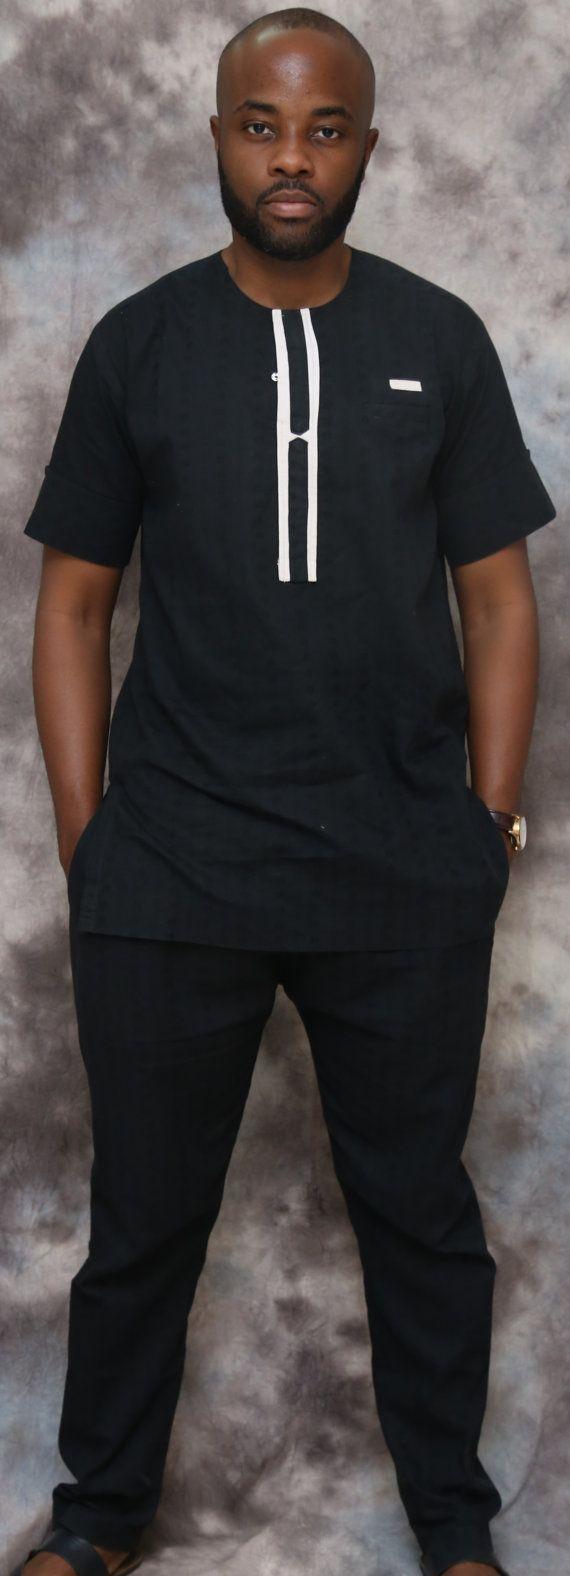 Polka Dot Masculine Africain V Tements Africains